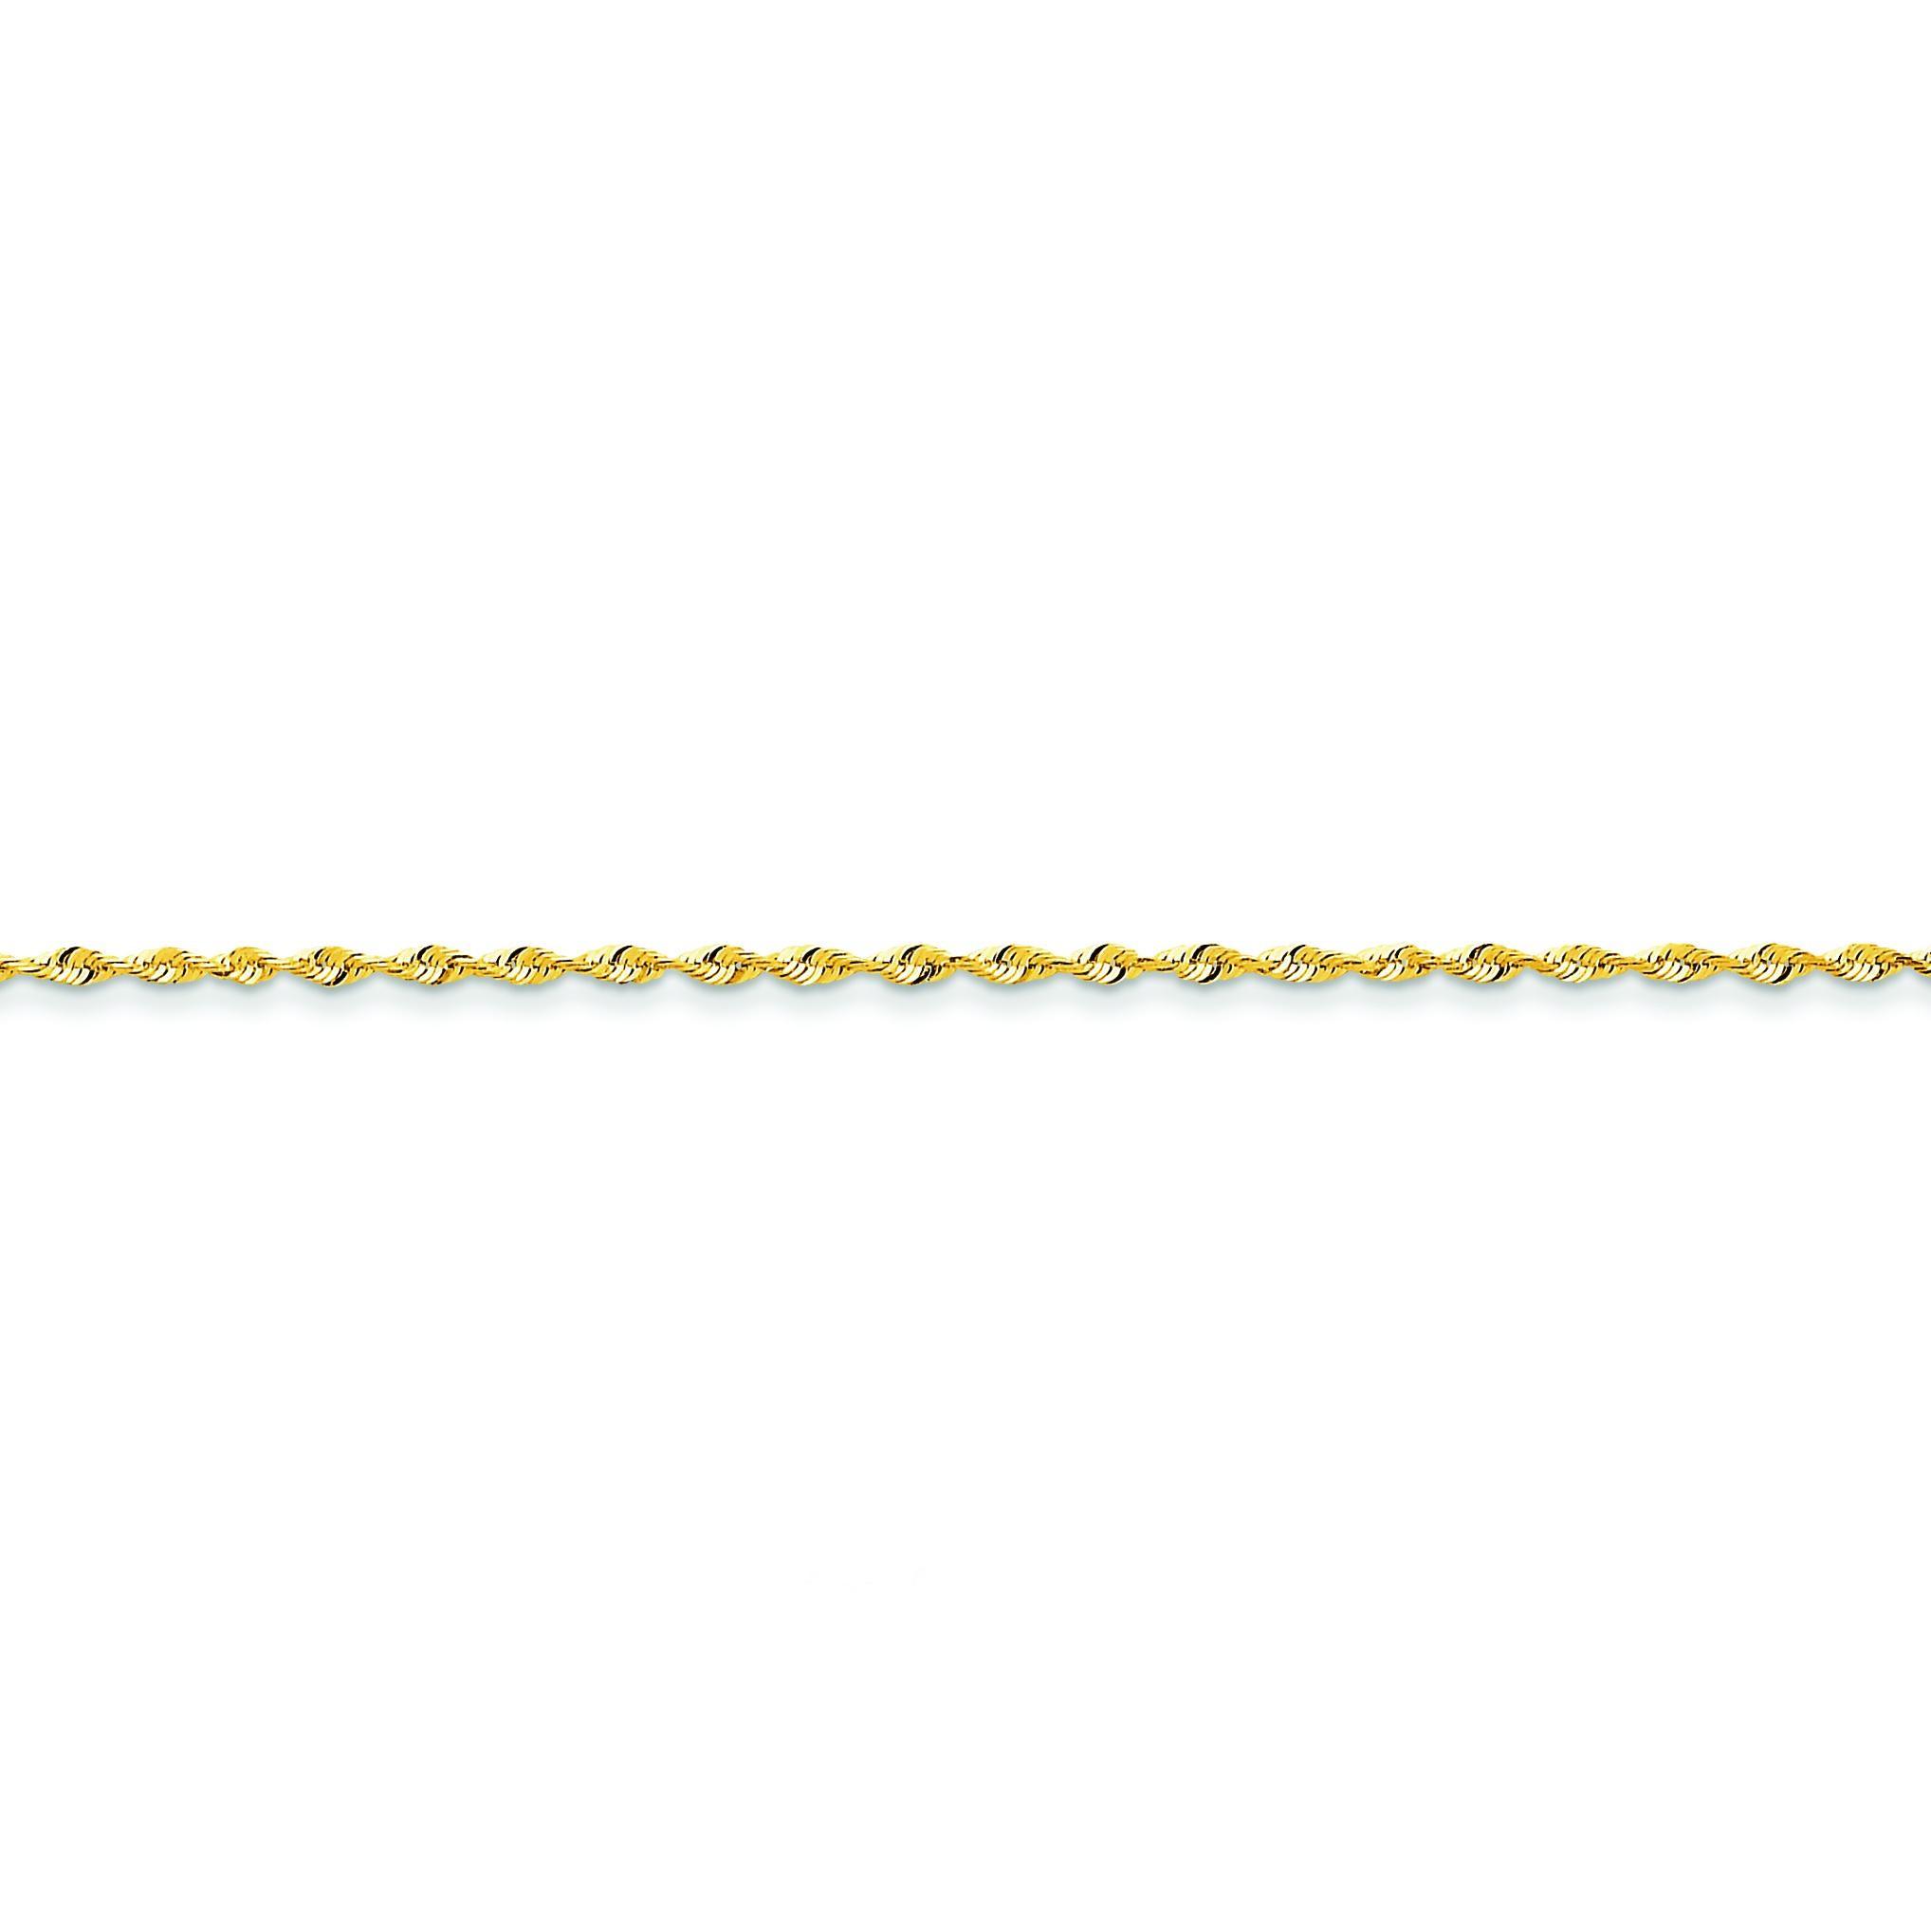 14k Yellow Gold 6 inch 1.80 mm Extra Light Diamond-cut Rope Chain Bracelet